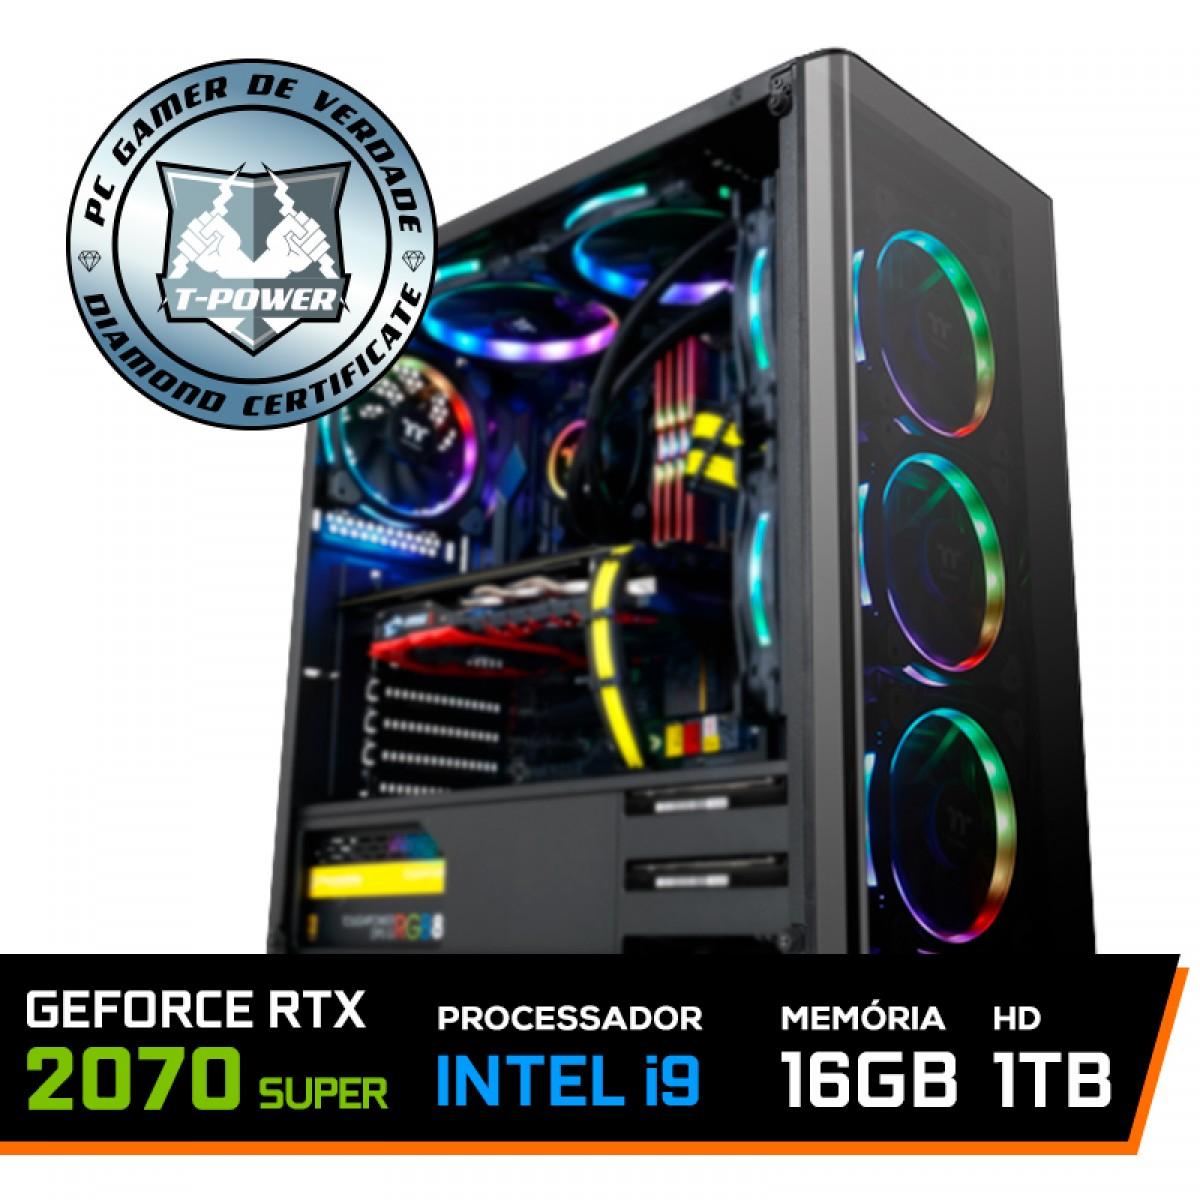 Pc Gamer T-Power Inferno LVL-4 Intel I9 9900K 3.60GHz / Geforce RTX 2070 Super / DDR4 16GB / HD 1TB / 750W